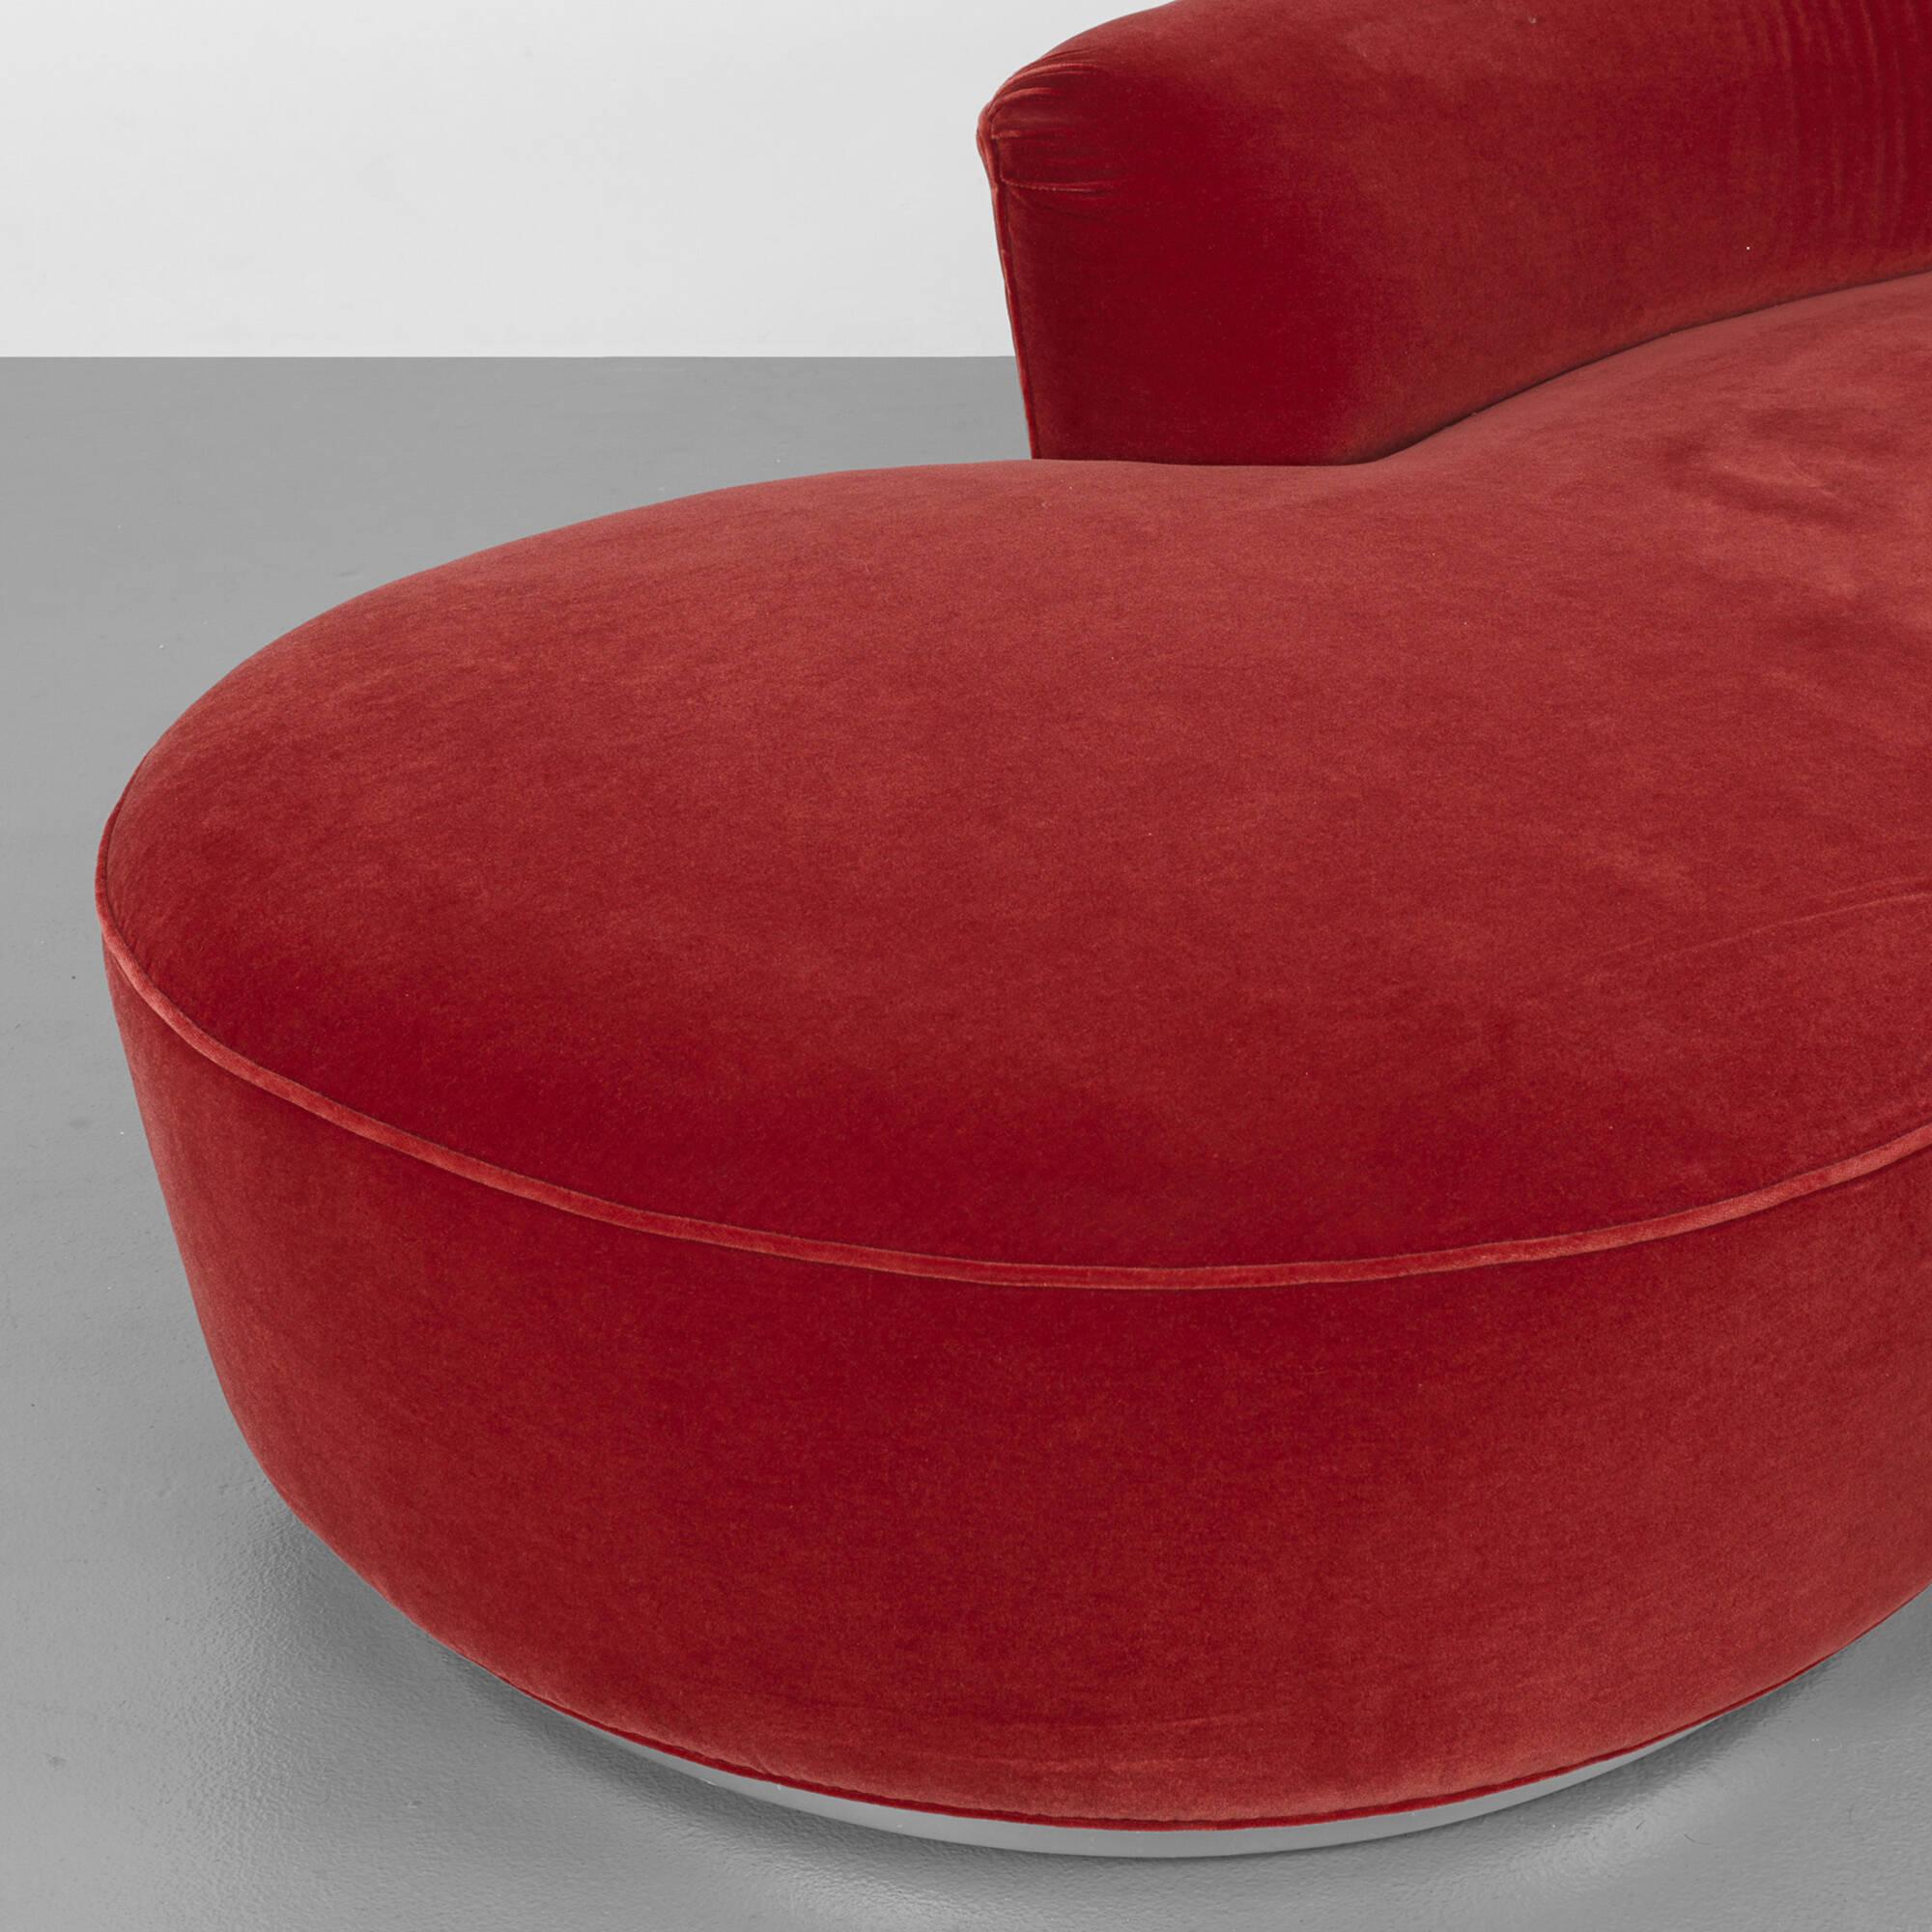 376 Vladimir Kagan sofa Design 12 June 2014 Auctions